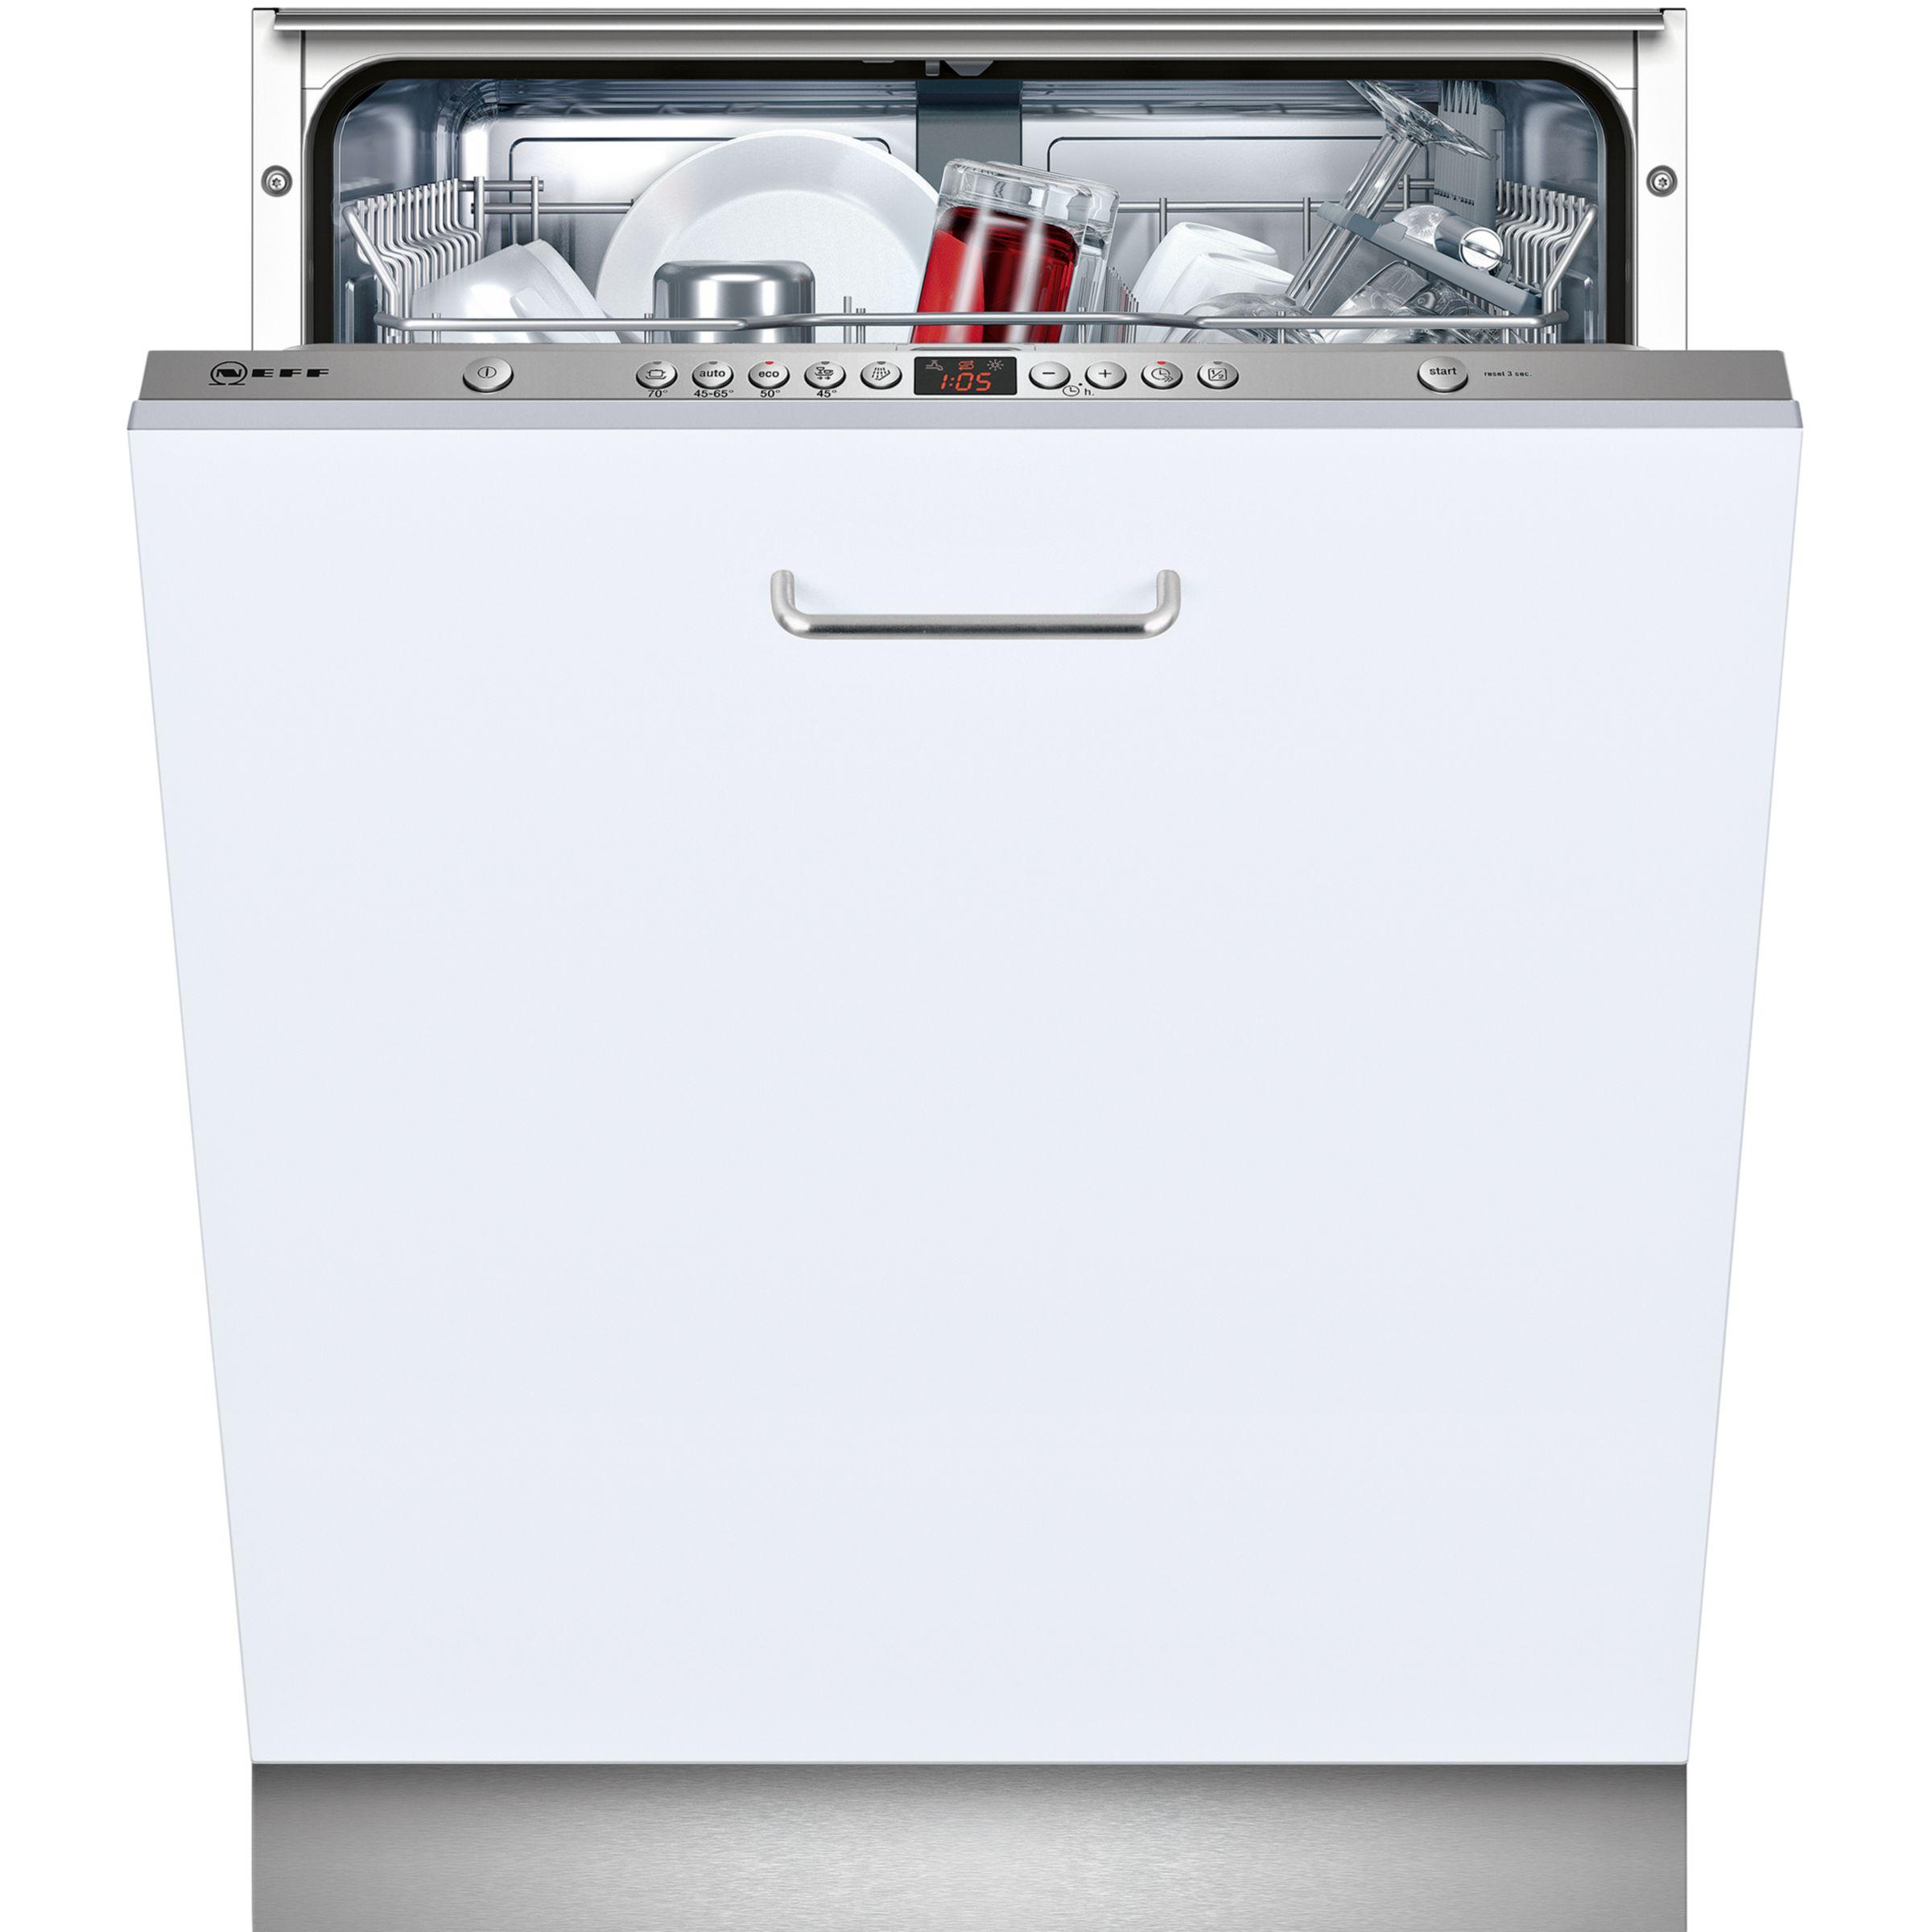 John Lewis Kitchen Appliances Built In Appliances Buying Guide